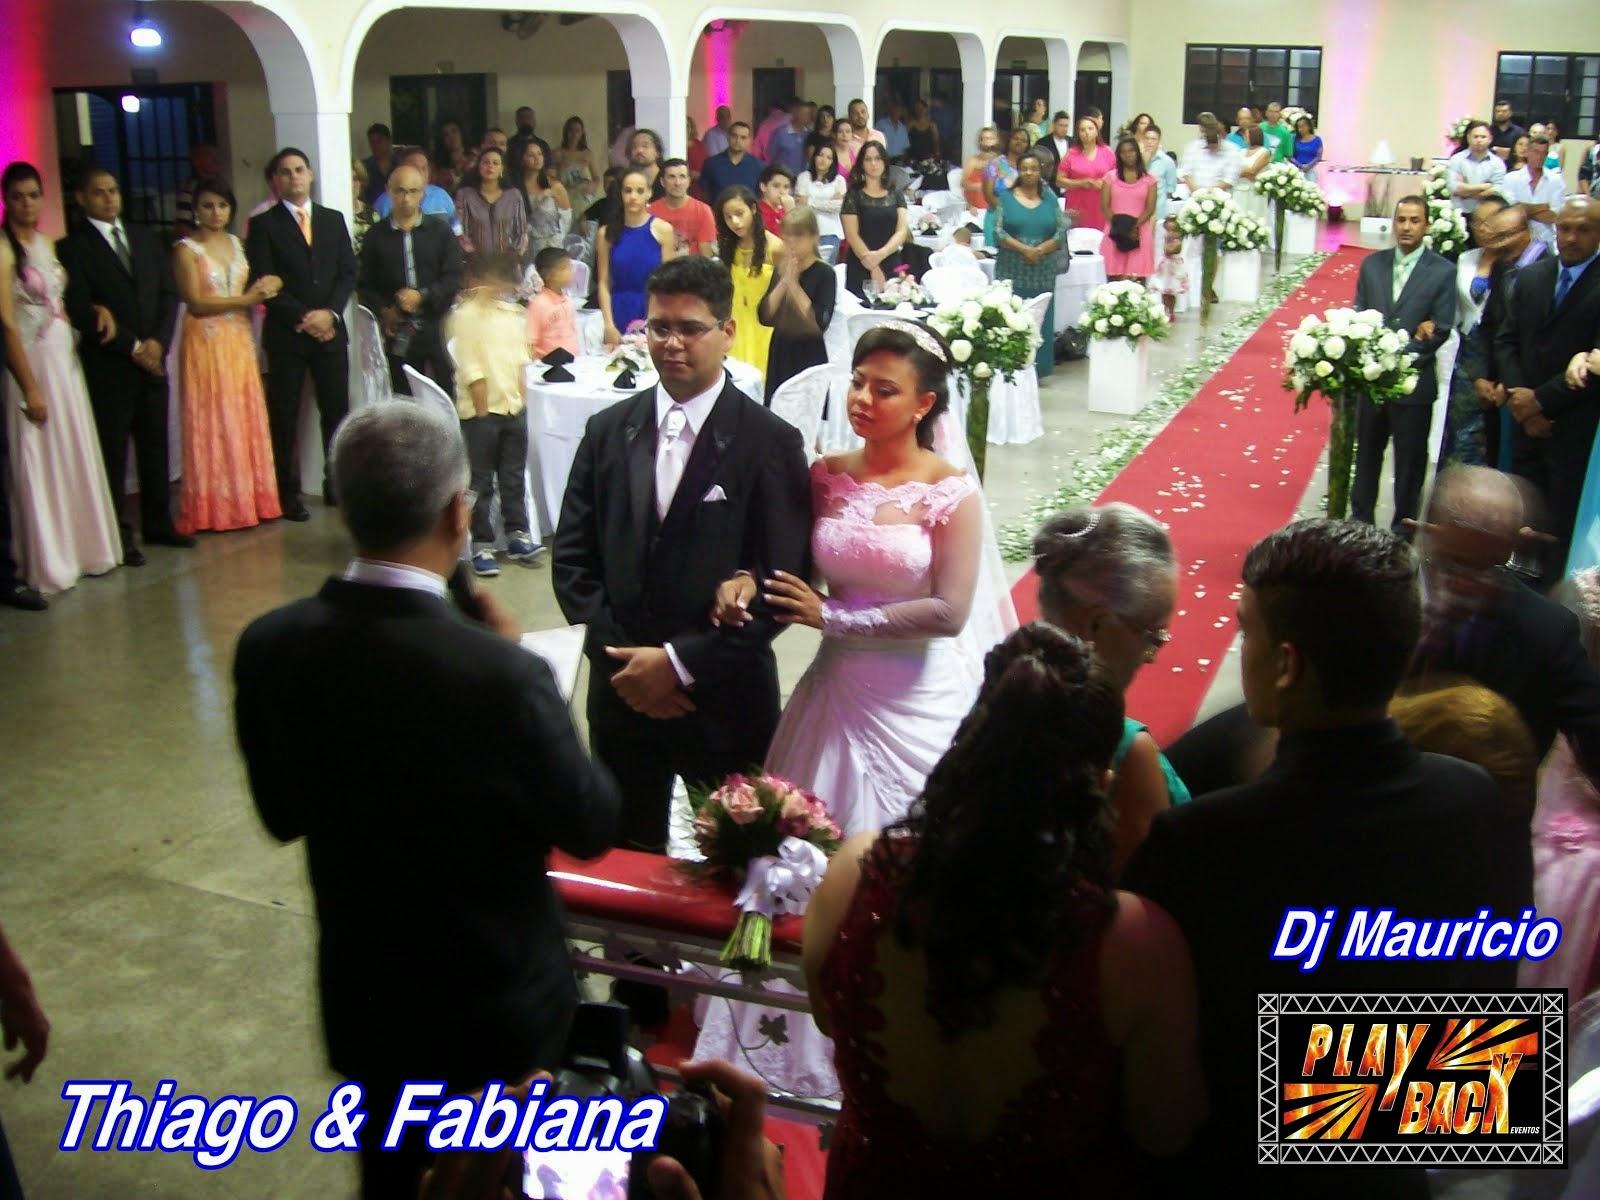 Thiago e Fabiana